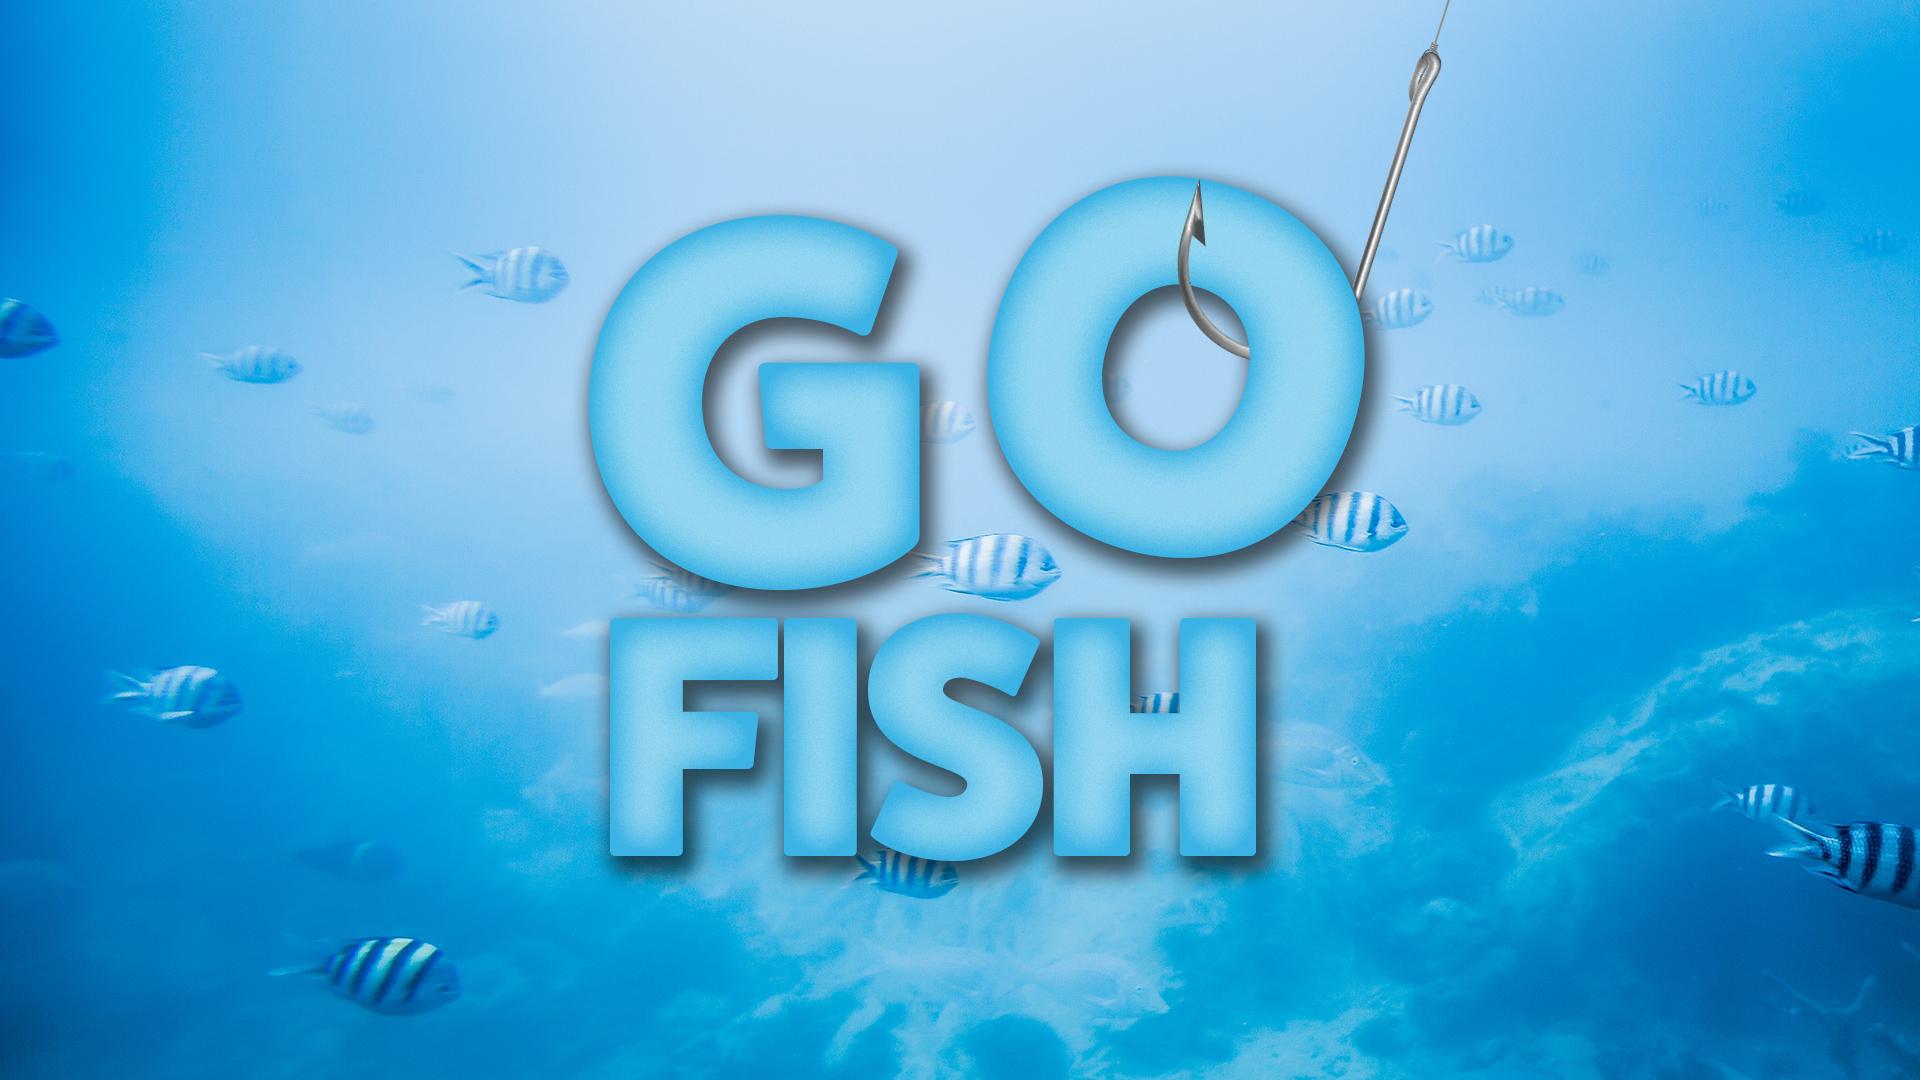 GoFish_Title.jpg